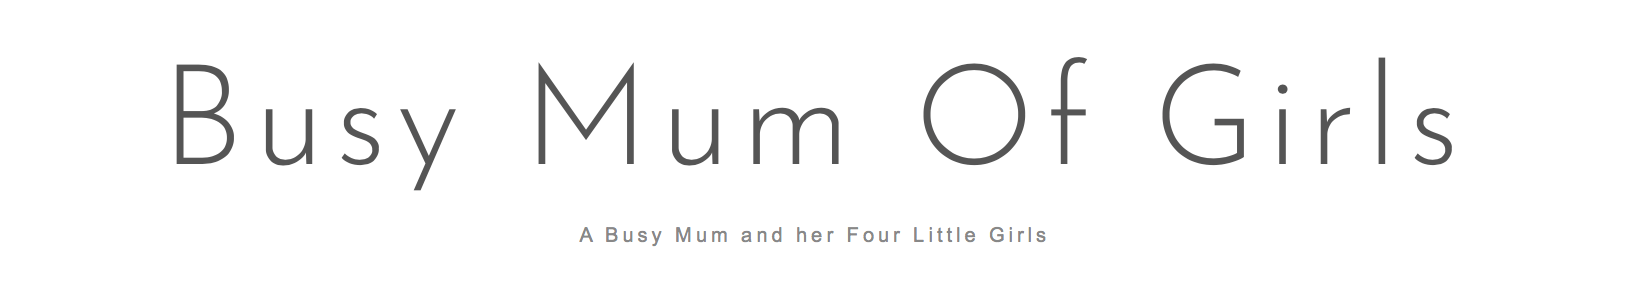 Busy mum of girls blog